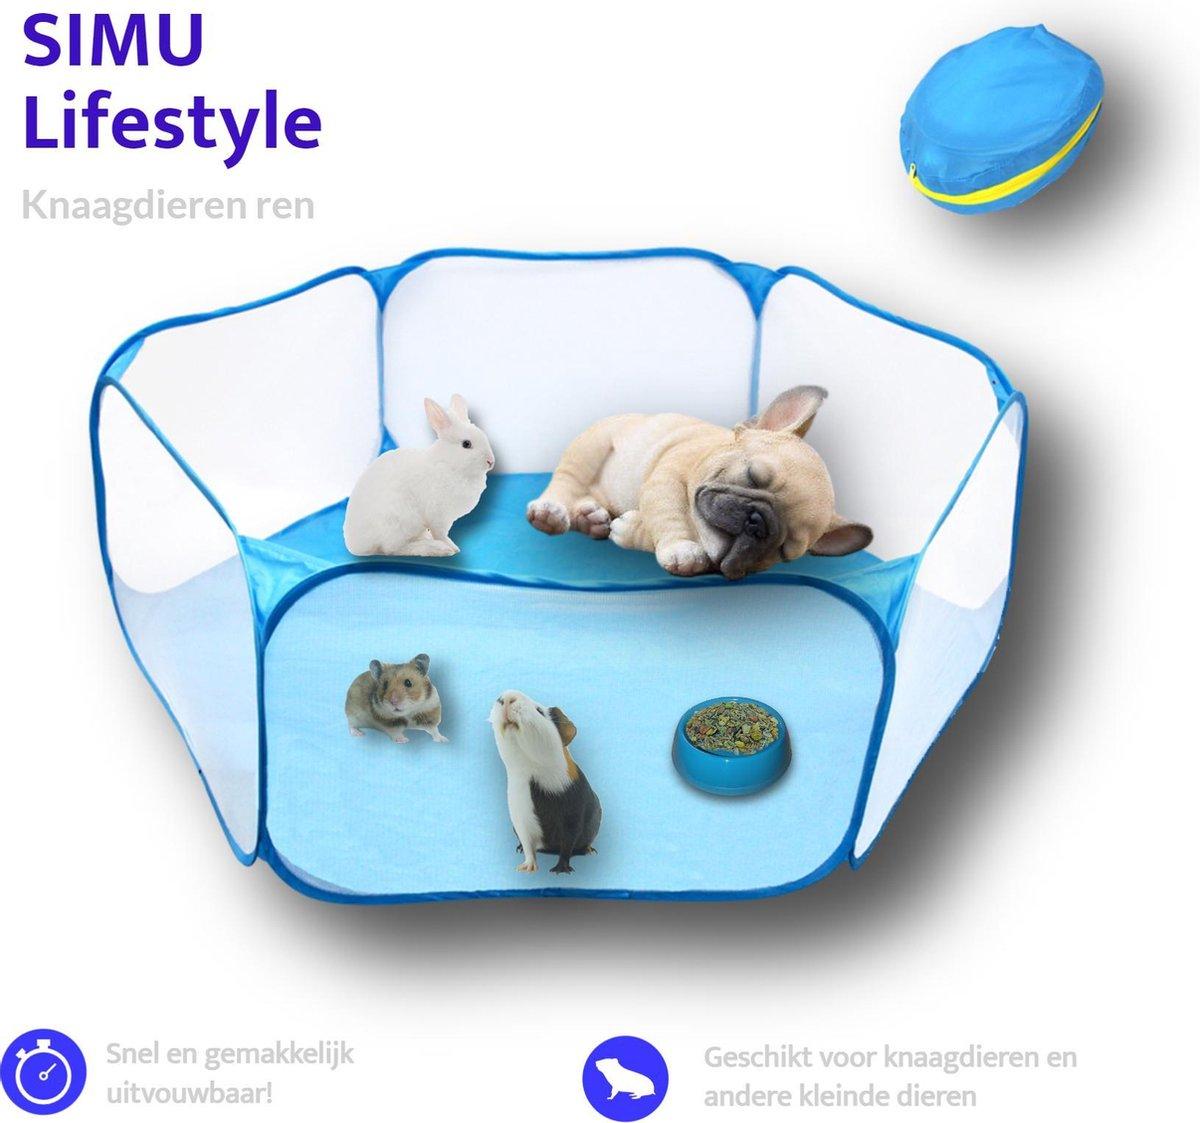 SIMU Lifestyle Opvouwbare Knaagdieren Ren - Cavia/Konijn/Hamster/Puppy/Kitten Kooi - Blauw - 120 cm